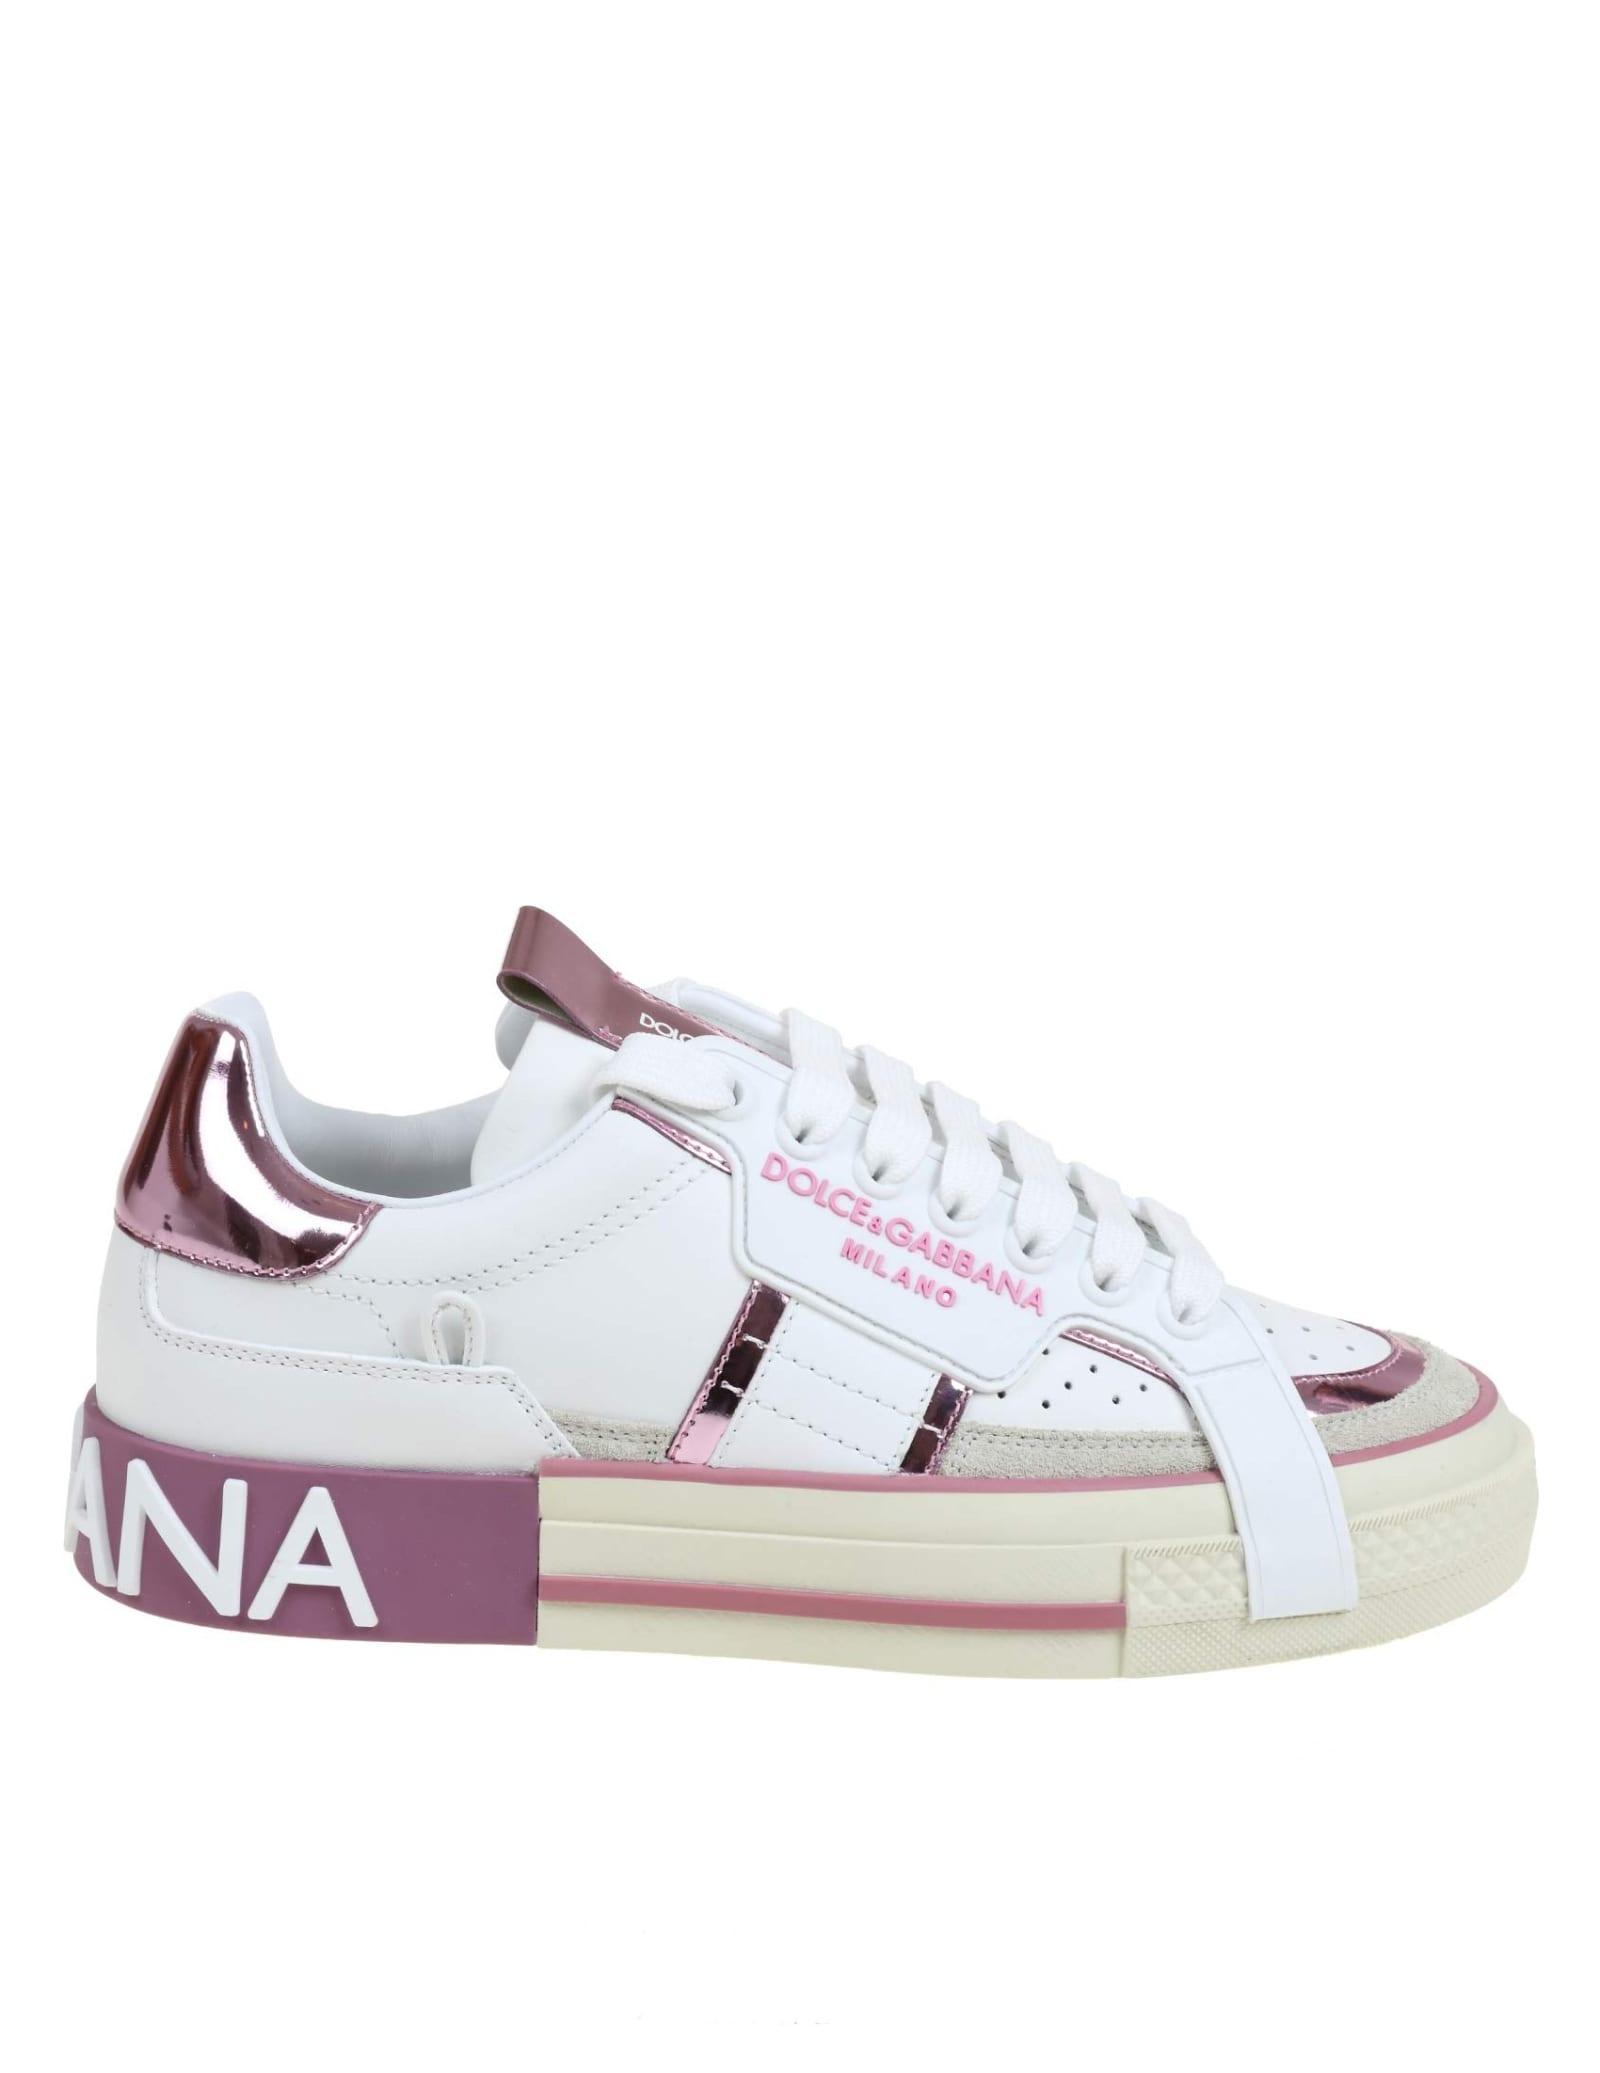 Dolce & Gabbana Custom 2.zero Sneakers In White Leather